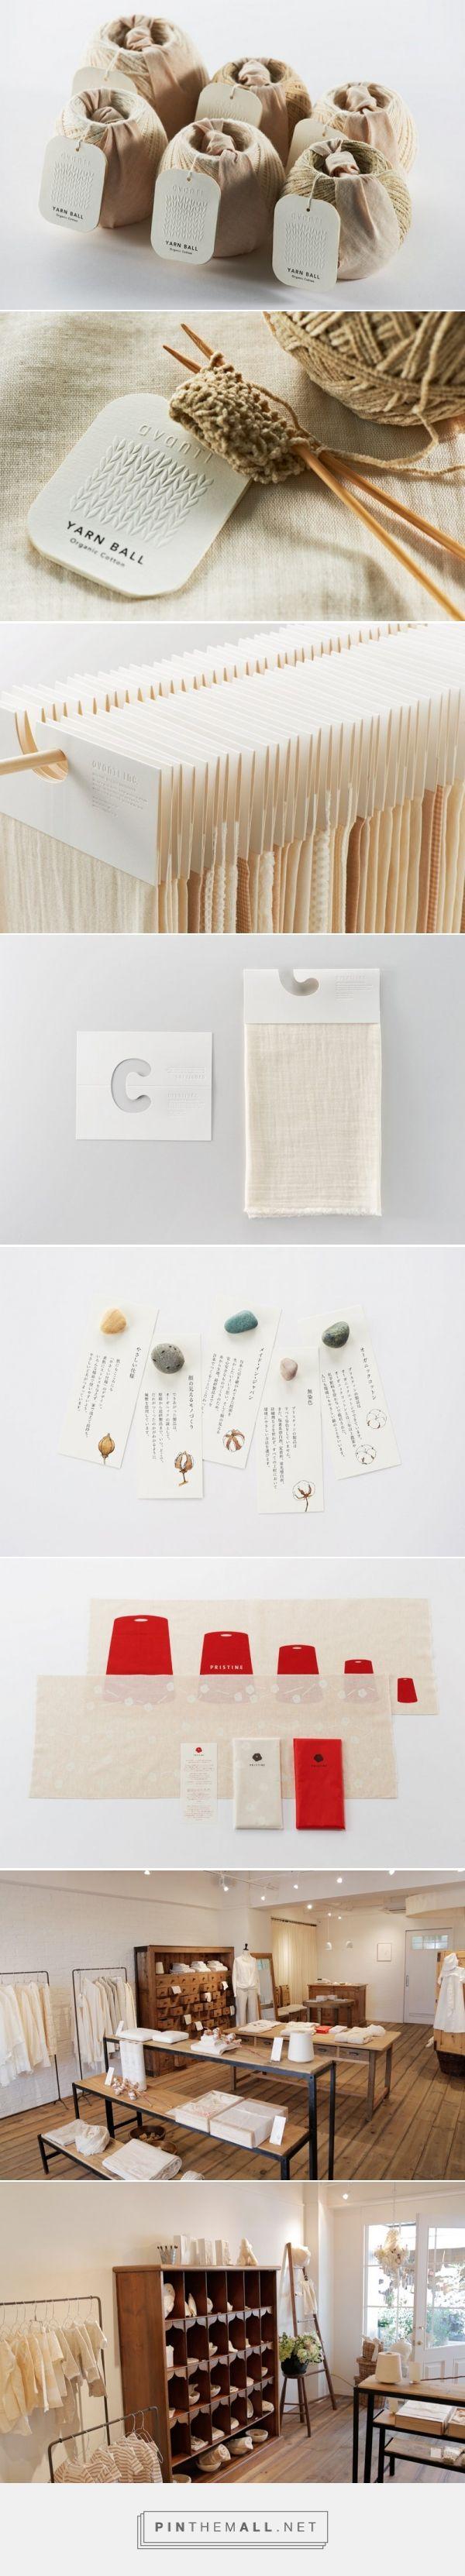 Identity For Organic Cotton Brand Pristine by Daigo Daikoku | Spoon & Tamago. Love the tags!